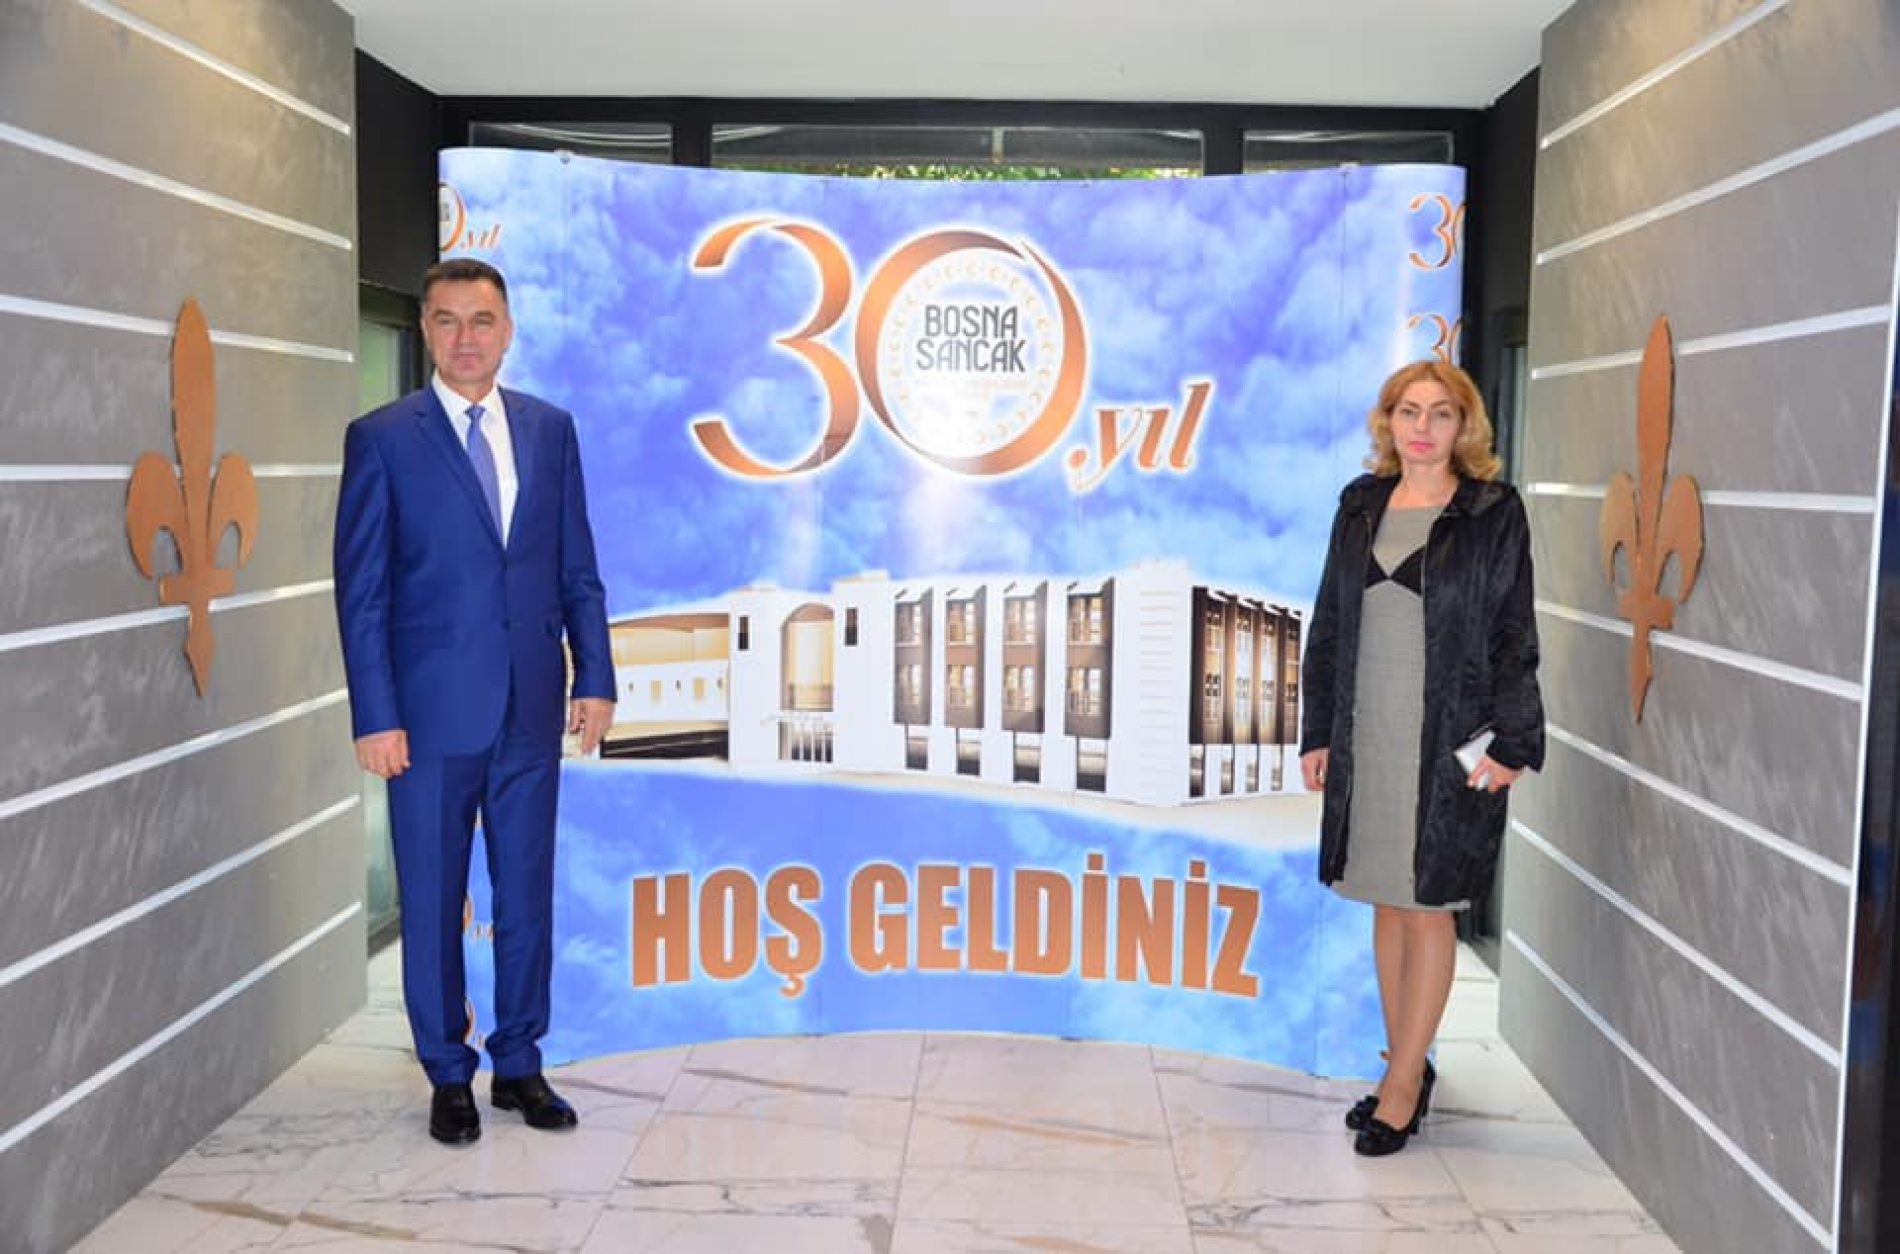 Otvoren novi objekat Kulturnog centra Bosna Sandžak u Istanbulu